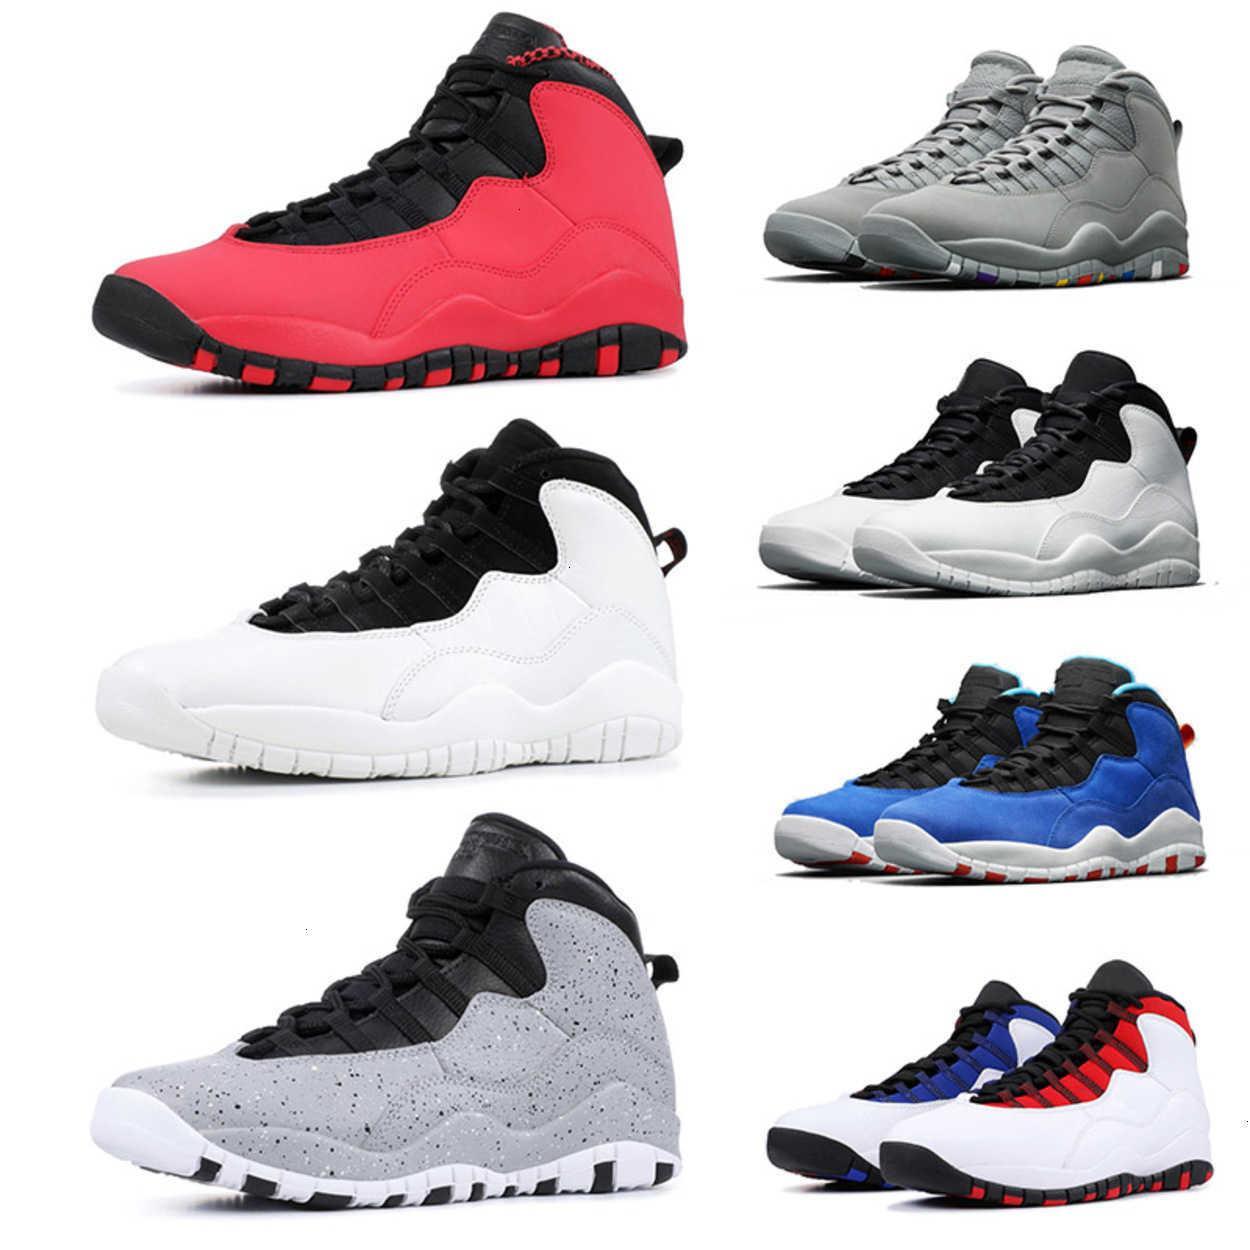 10s мужские баскетбольные туфли 10 Orlando Tinker Racer Blue Cement WestBrook Я Back Black White Trainer NakeskinИорданияRetros кроссовка